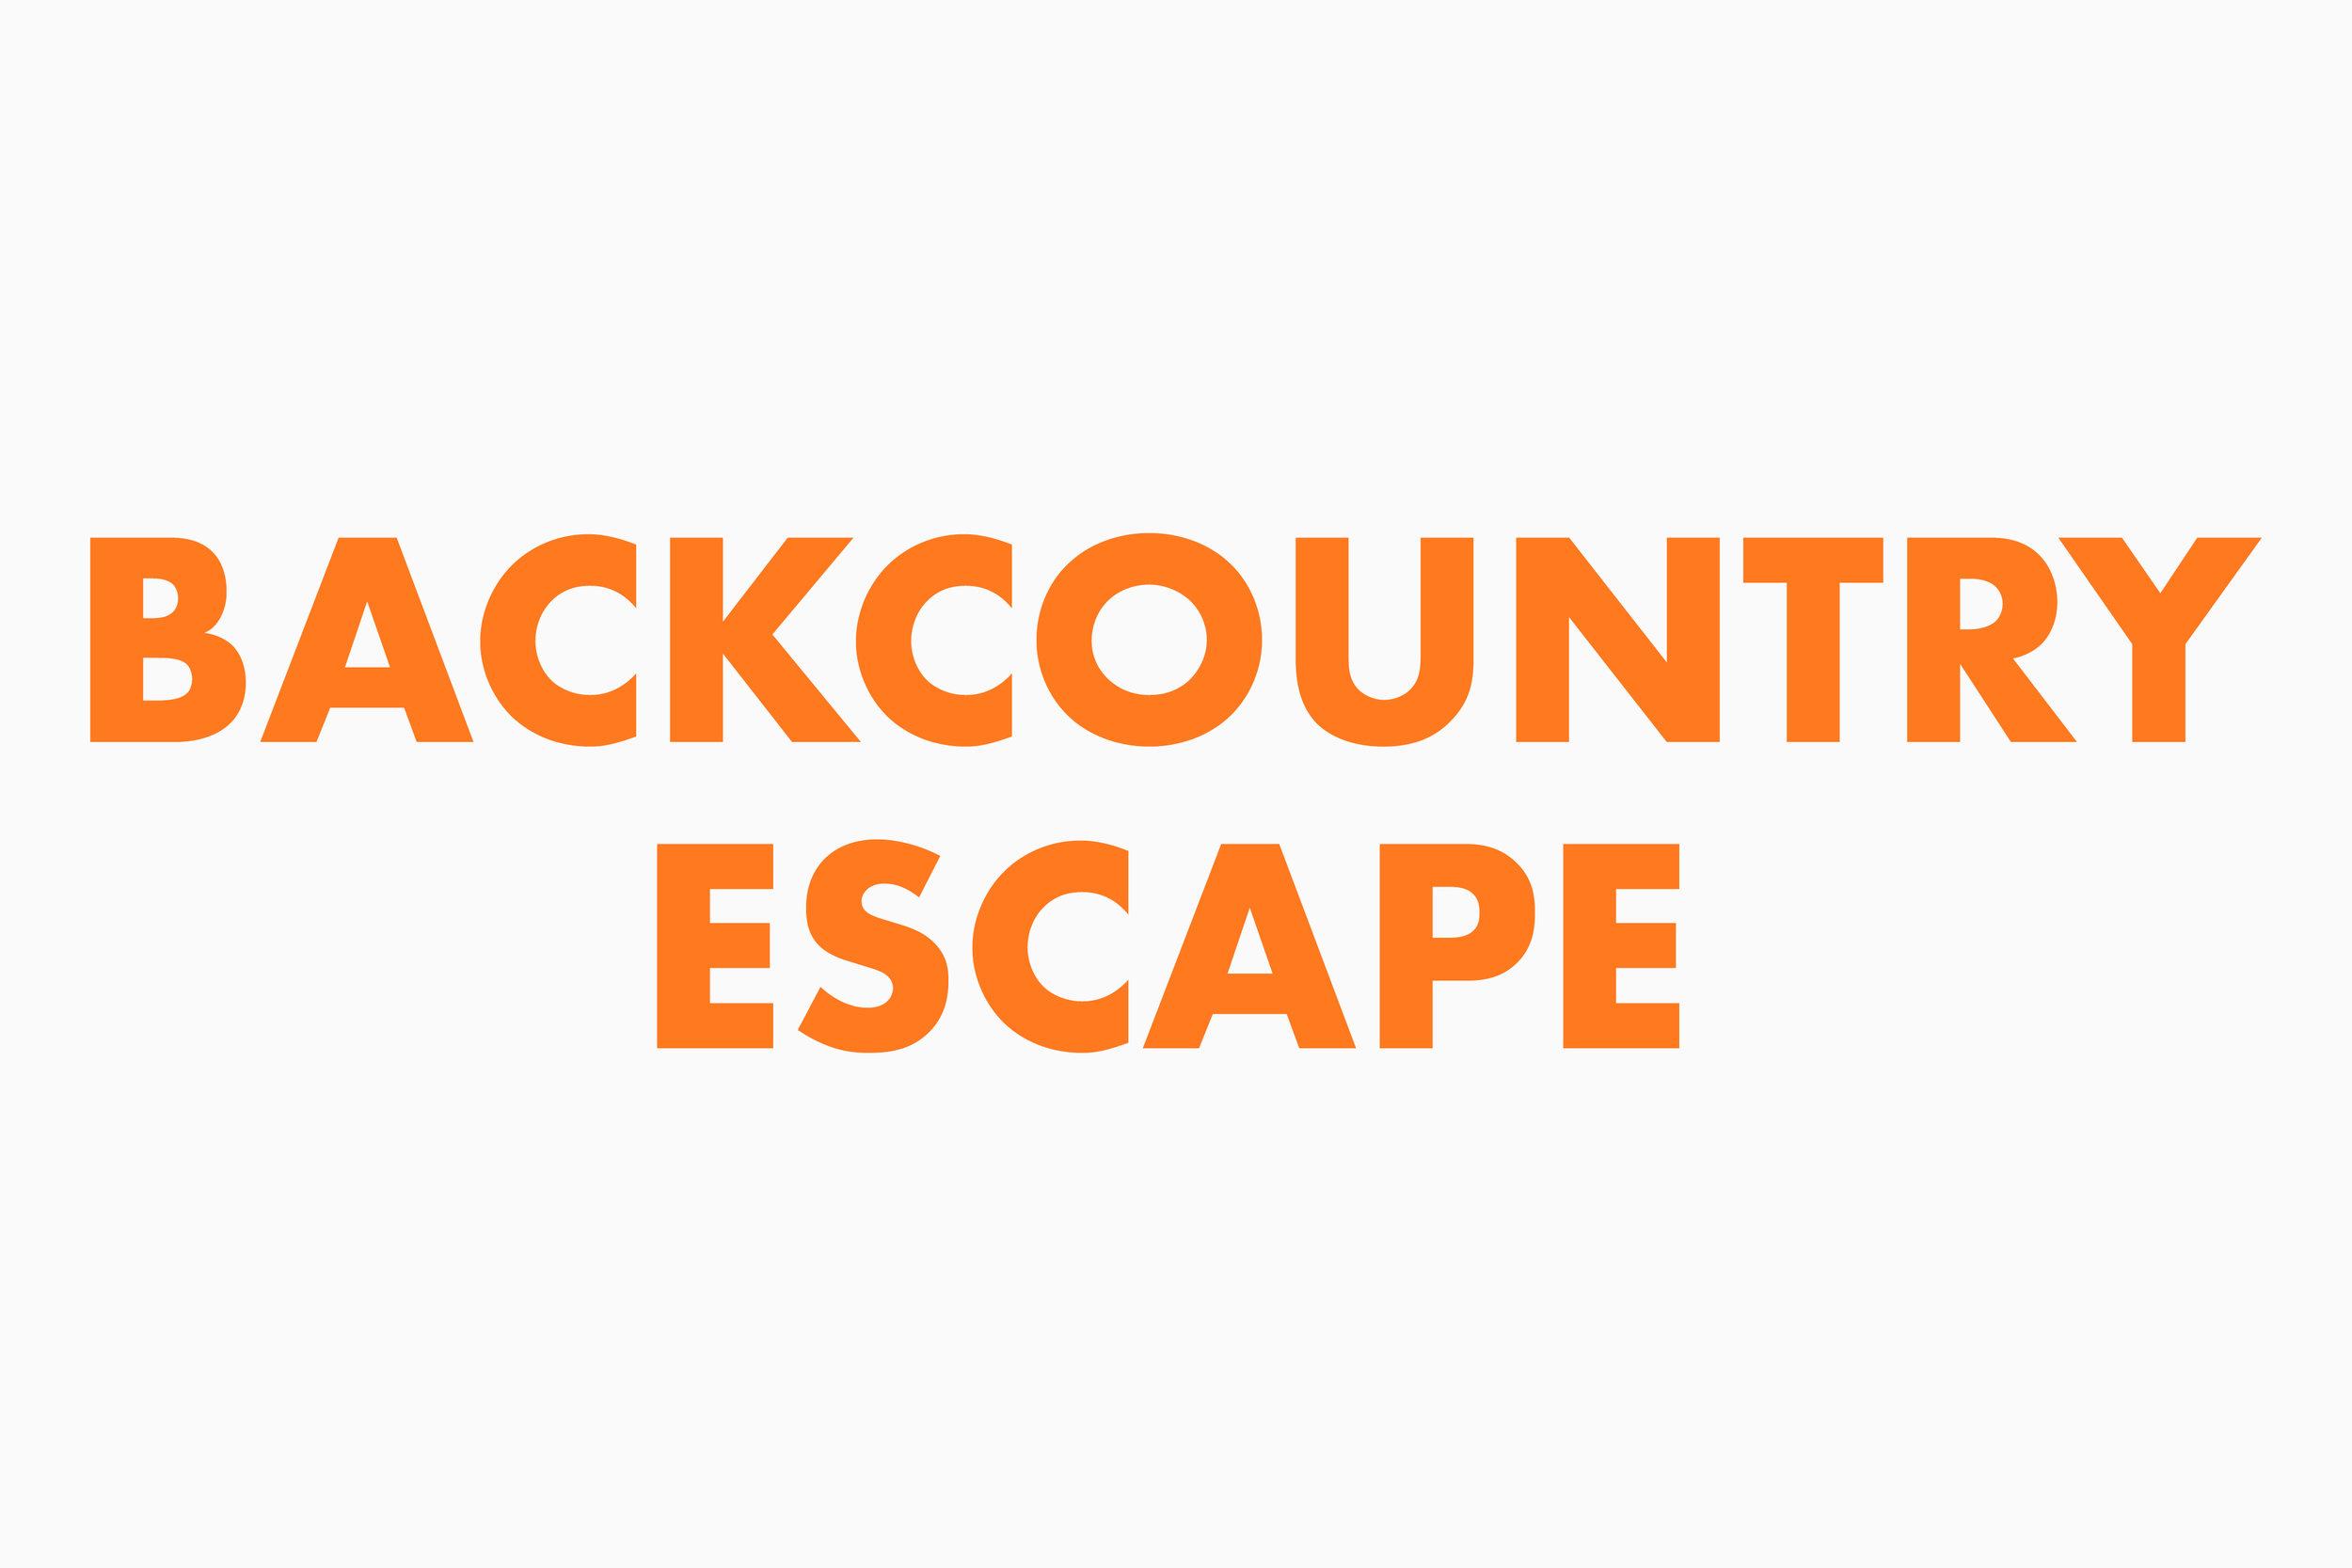 backcountry_escape.jpg